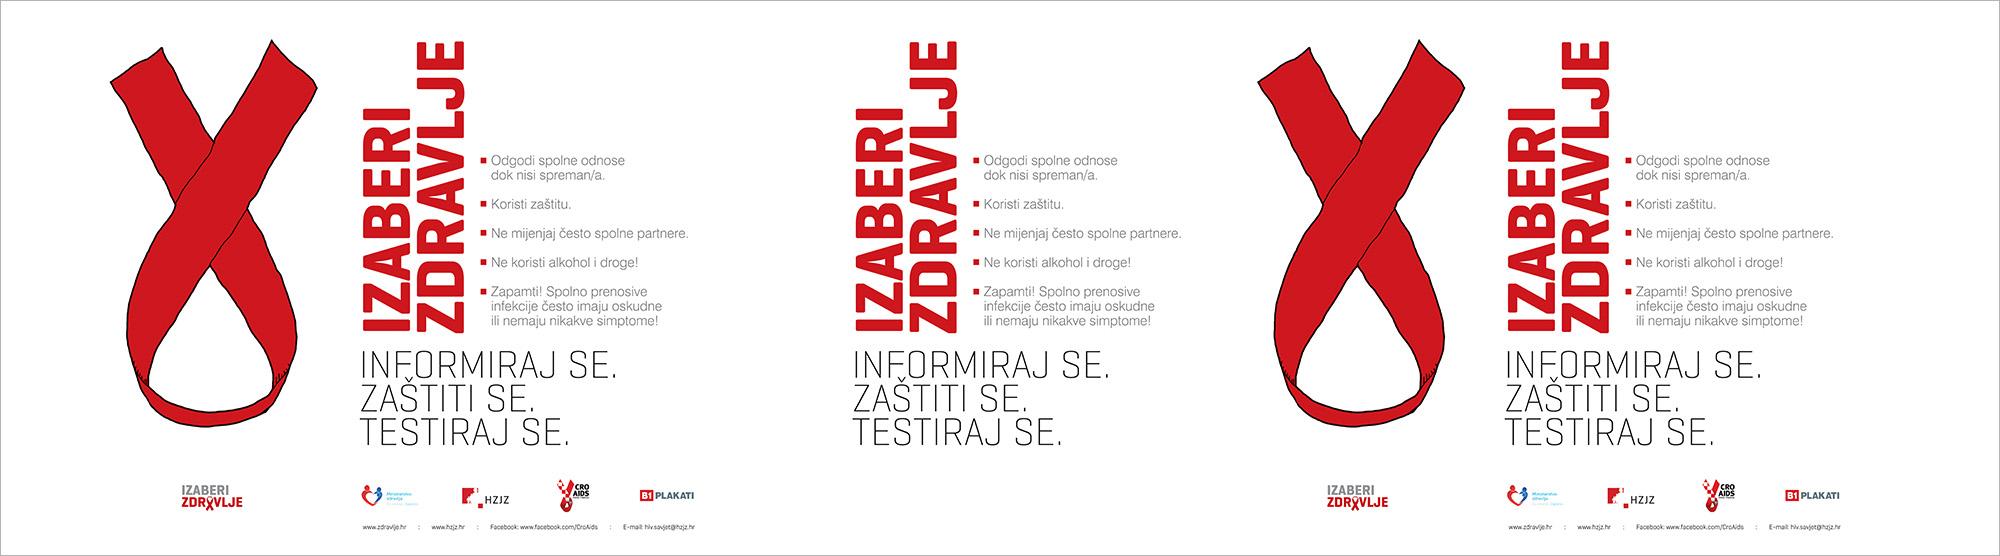 Plakat ljetna kampanja - Odgovorno spolno ponašanje- 2014-SVLACIONICA preview